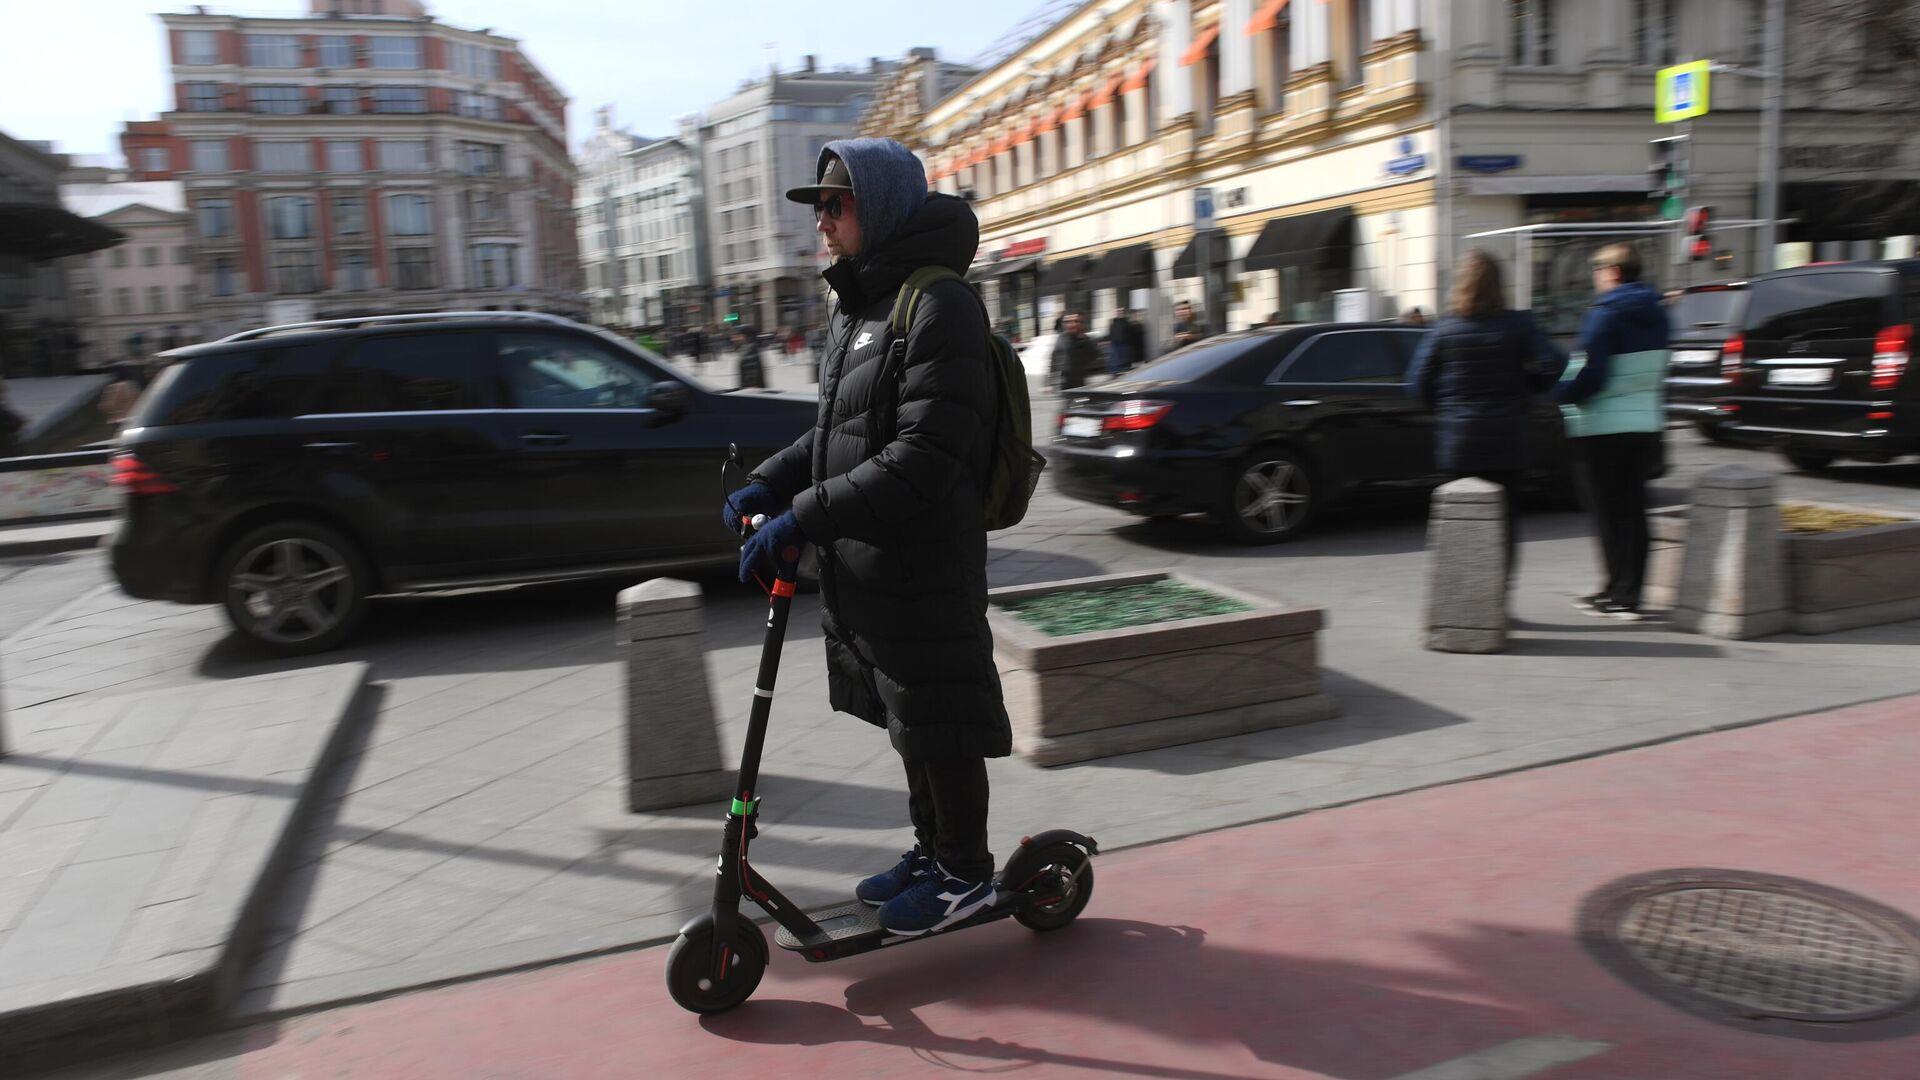 Мужчина едет на электросамокате - РИА Новости, 1920, 03.12.2020